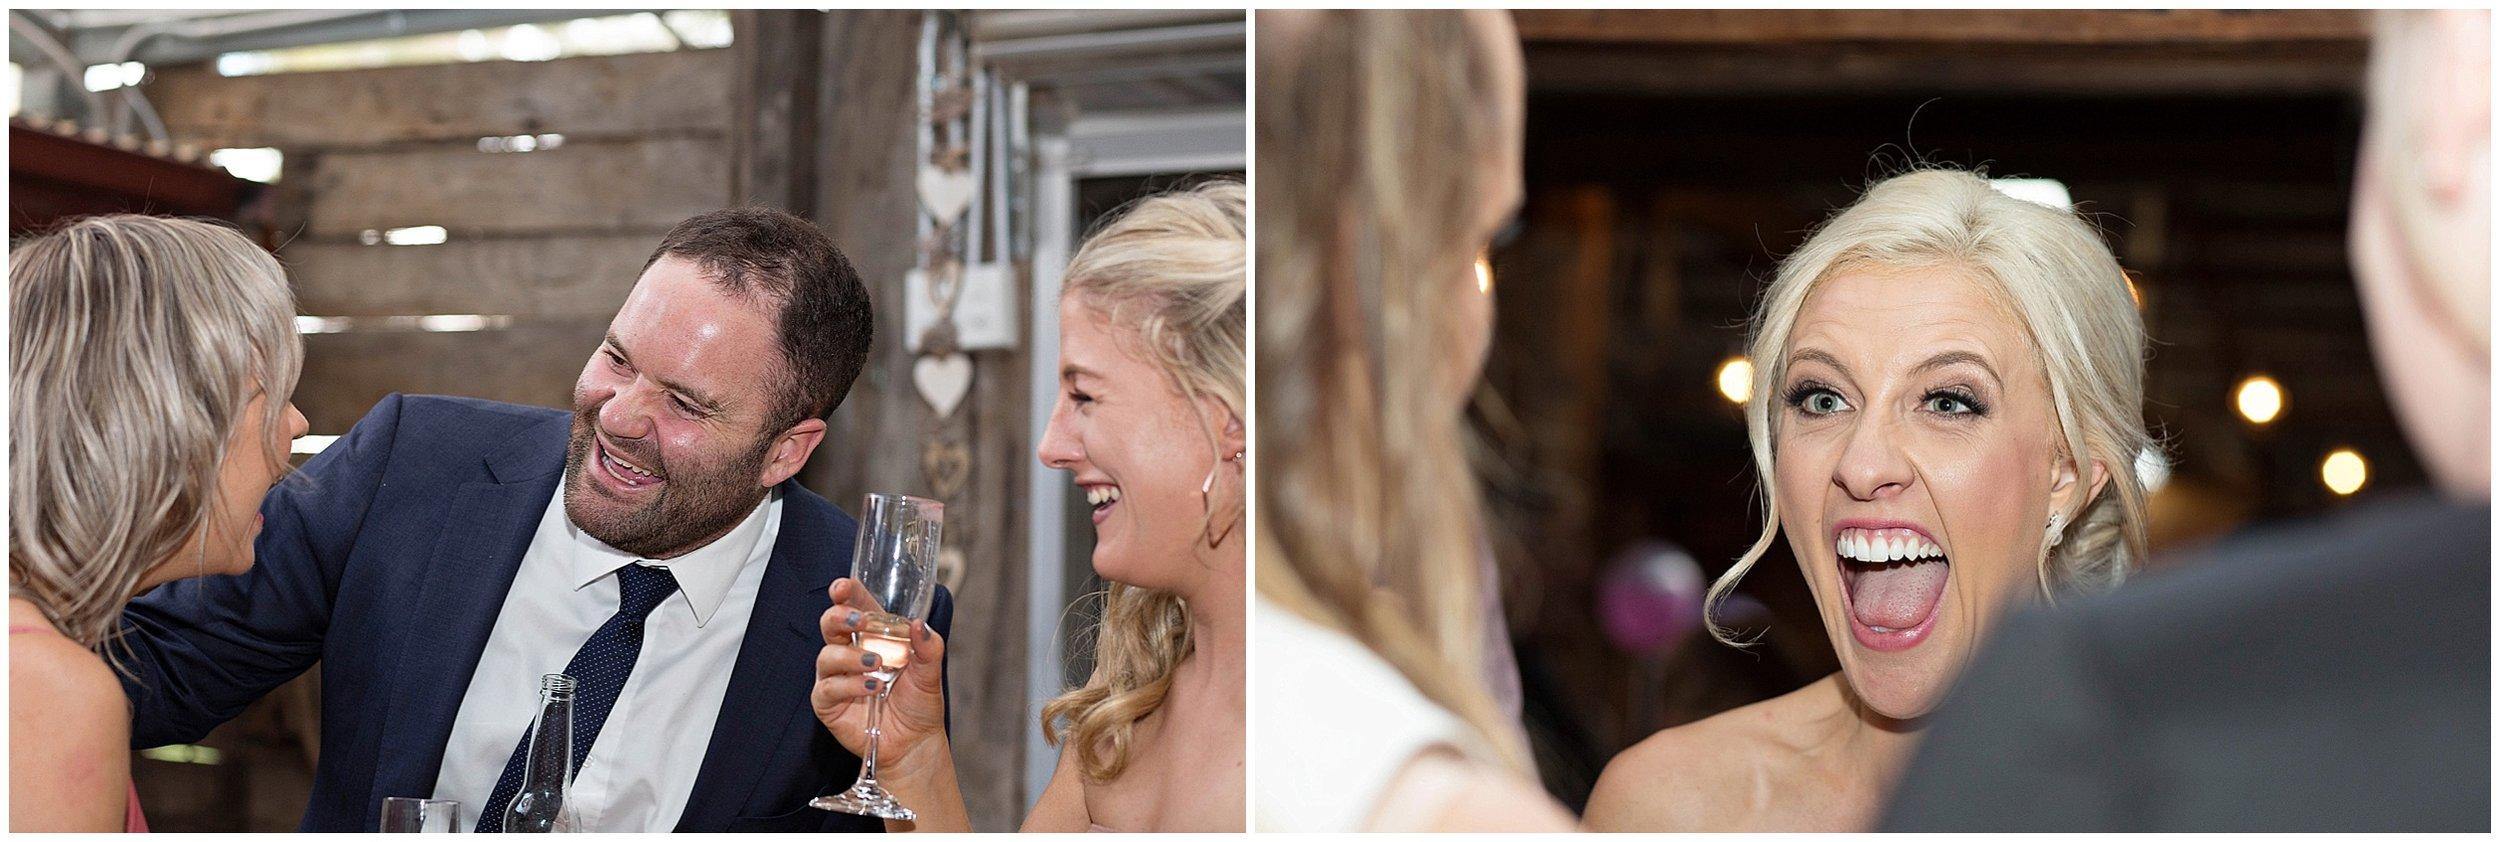 shepparton-wedding-photographer_0099.jpg